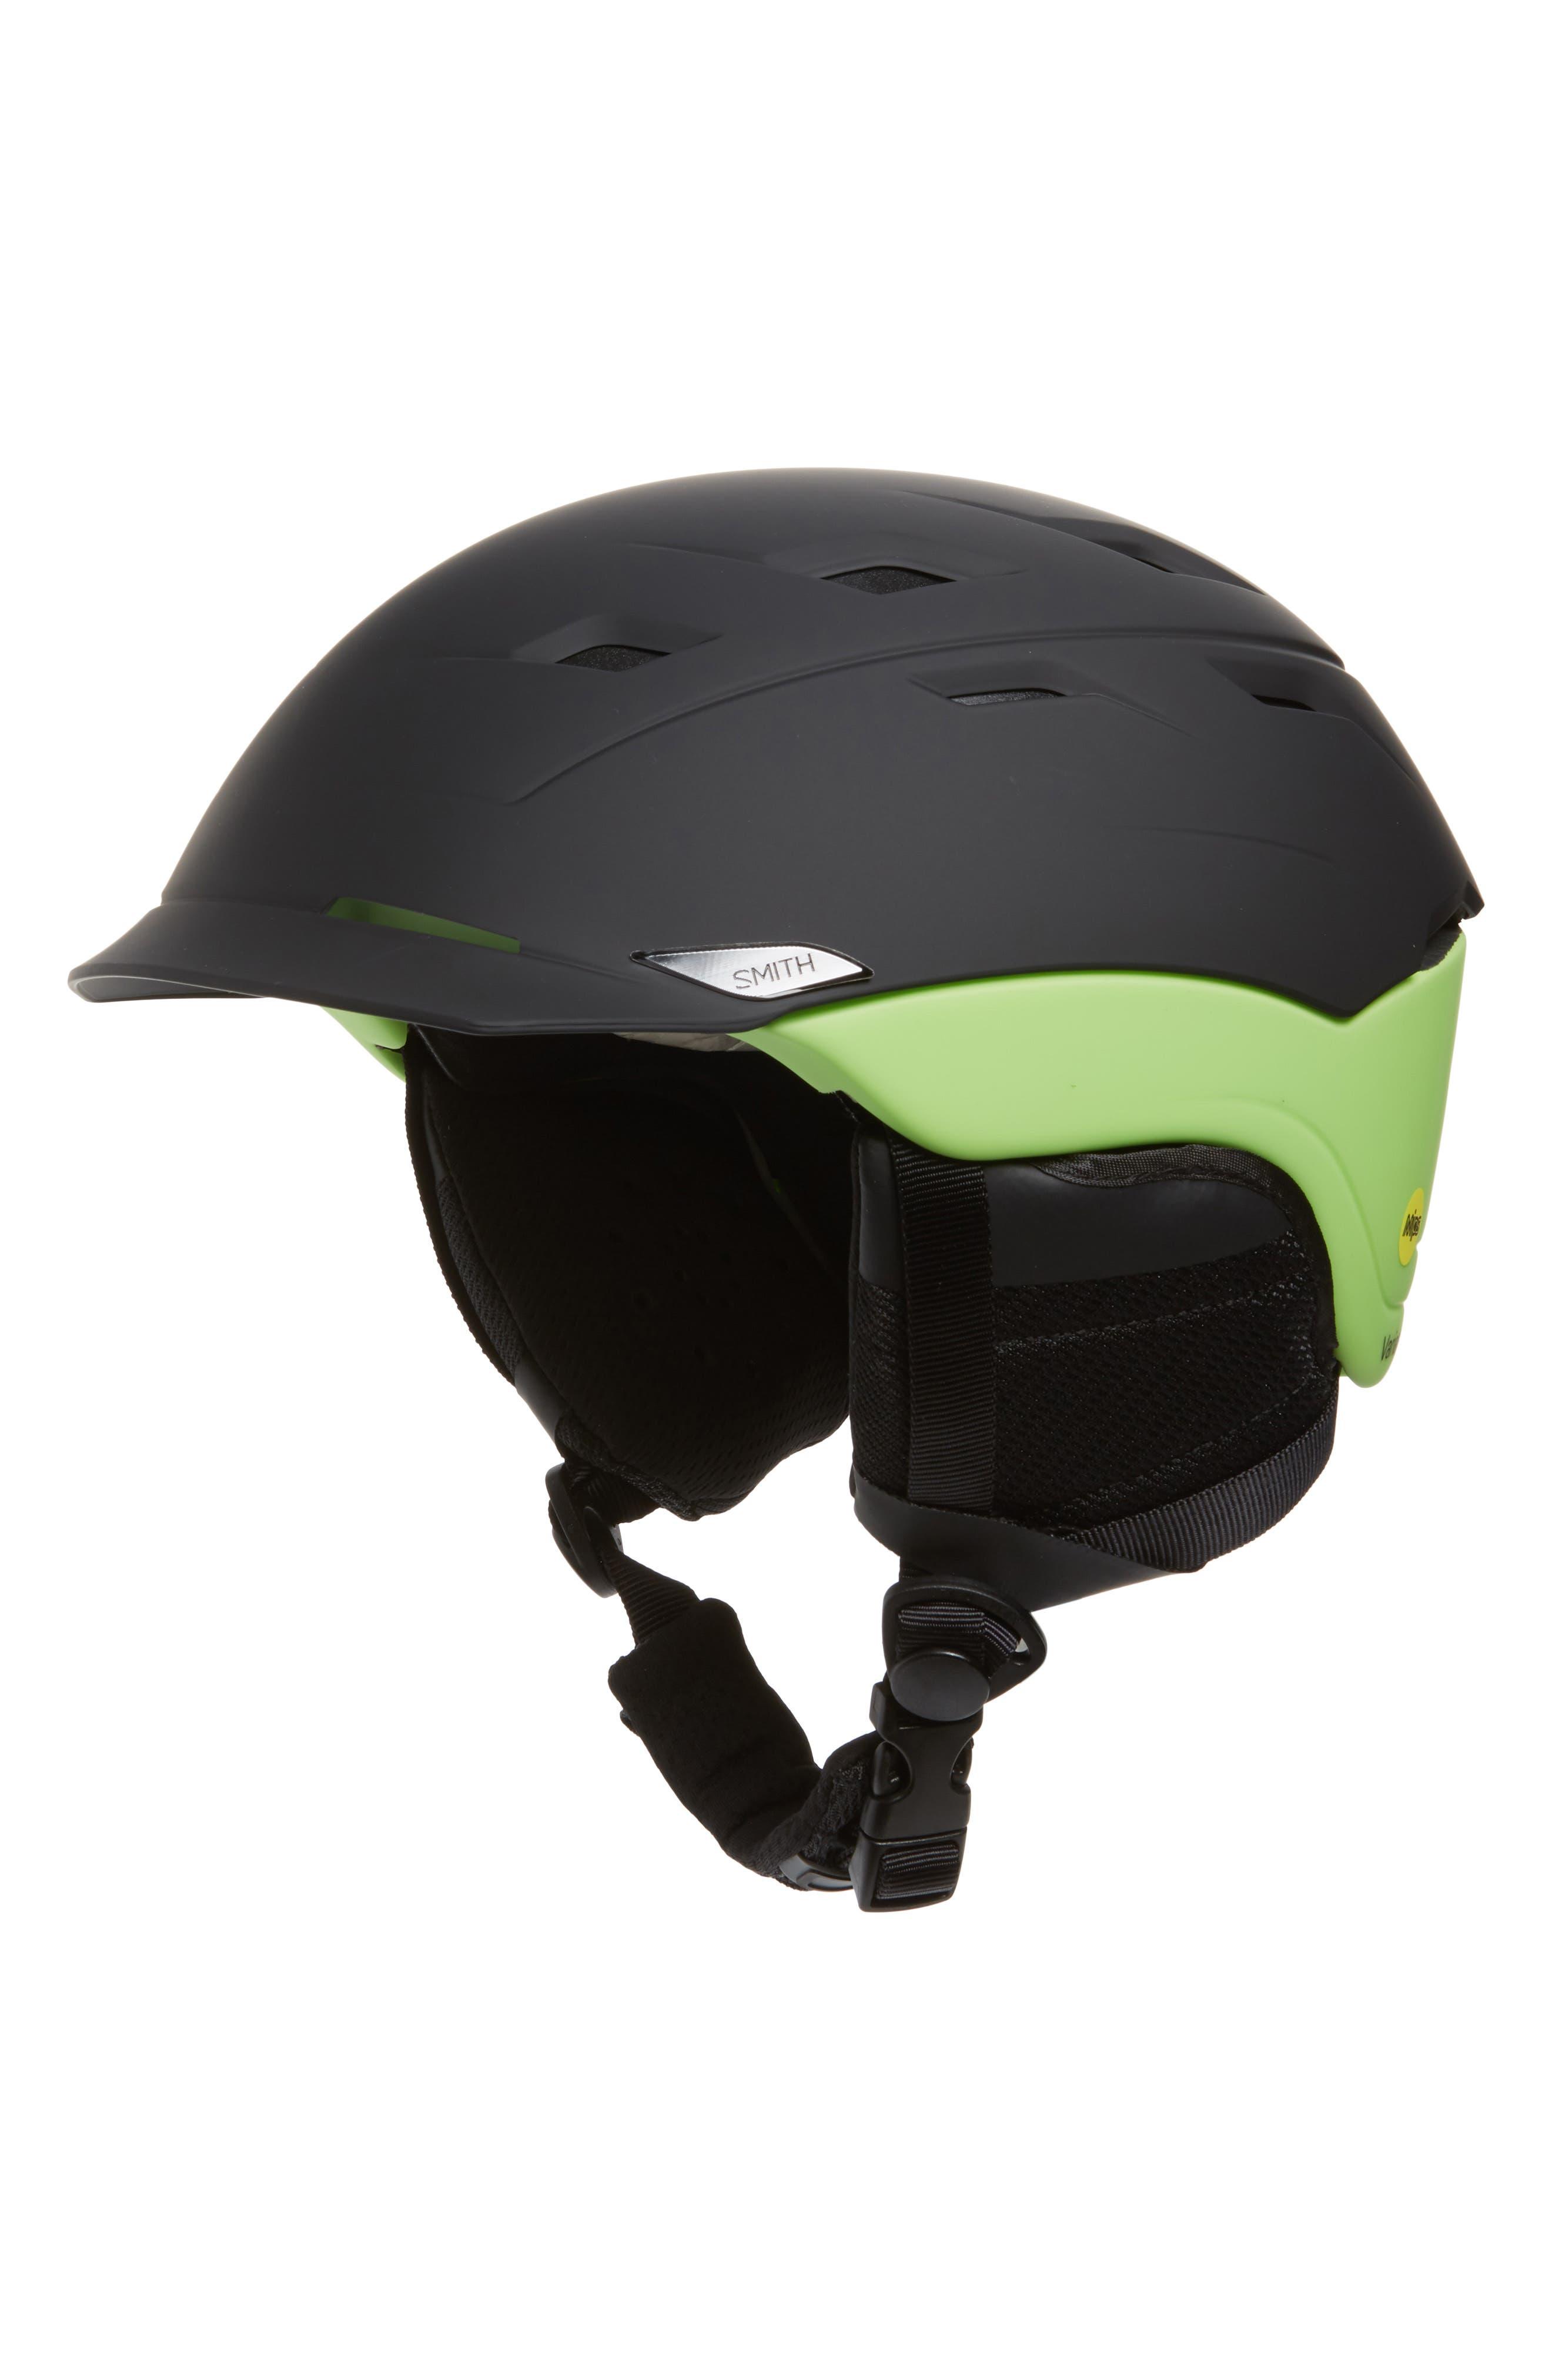 Variance MIPS Snow Helmet,                             Main thumbnail 1, color,                             MATTE BLACK / FLASH